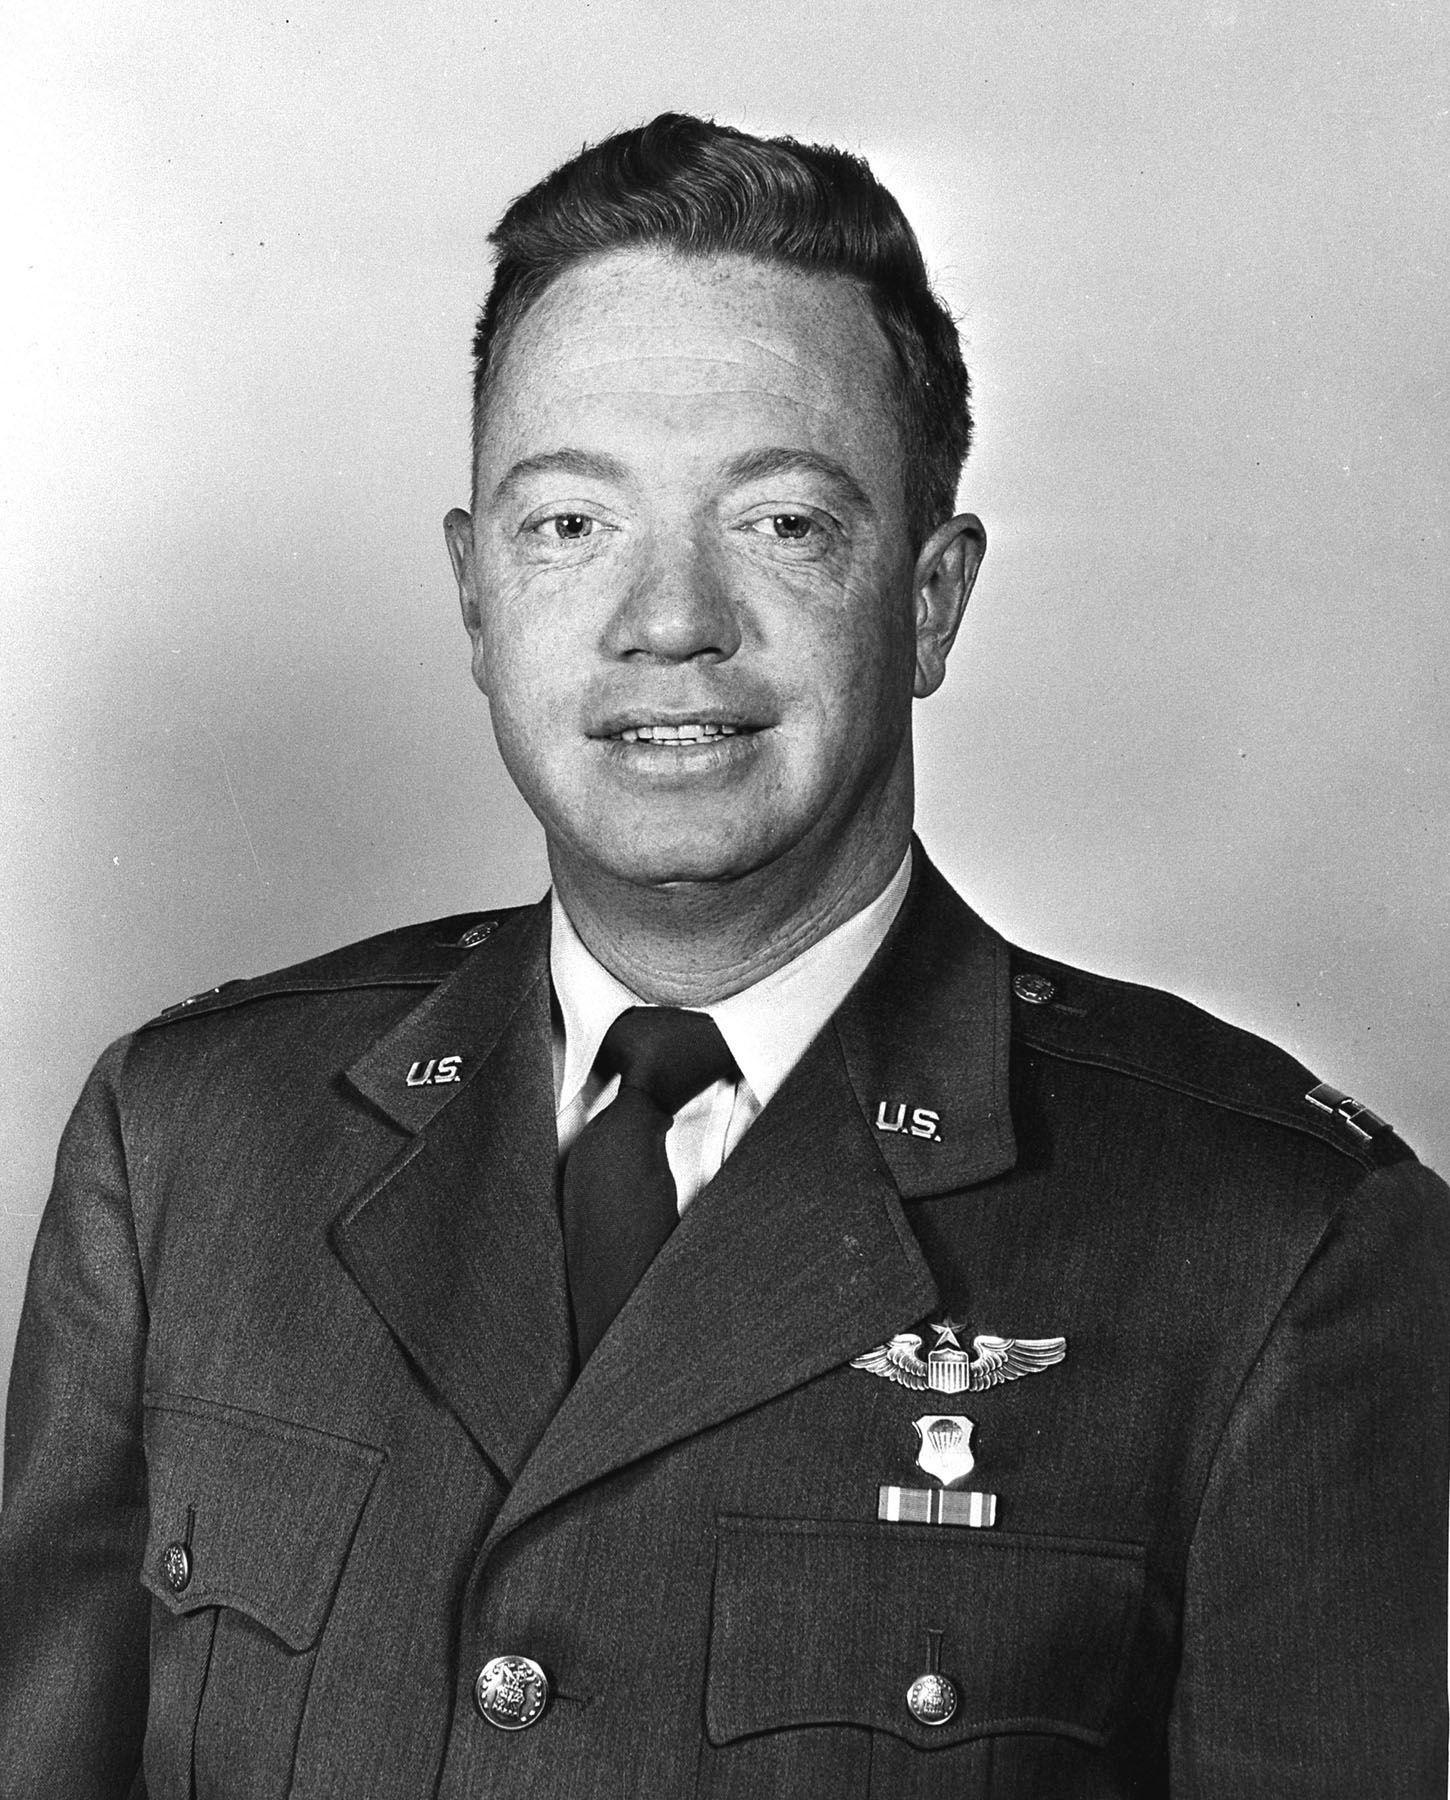 Captain Joseph W. Kitinger, United States Air Force